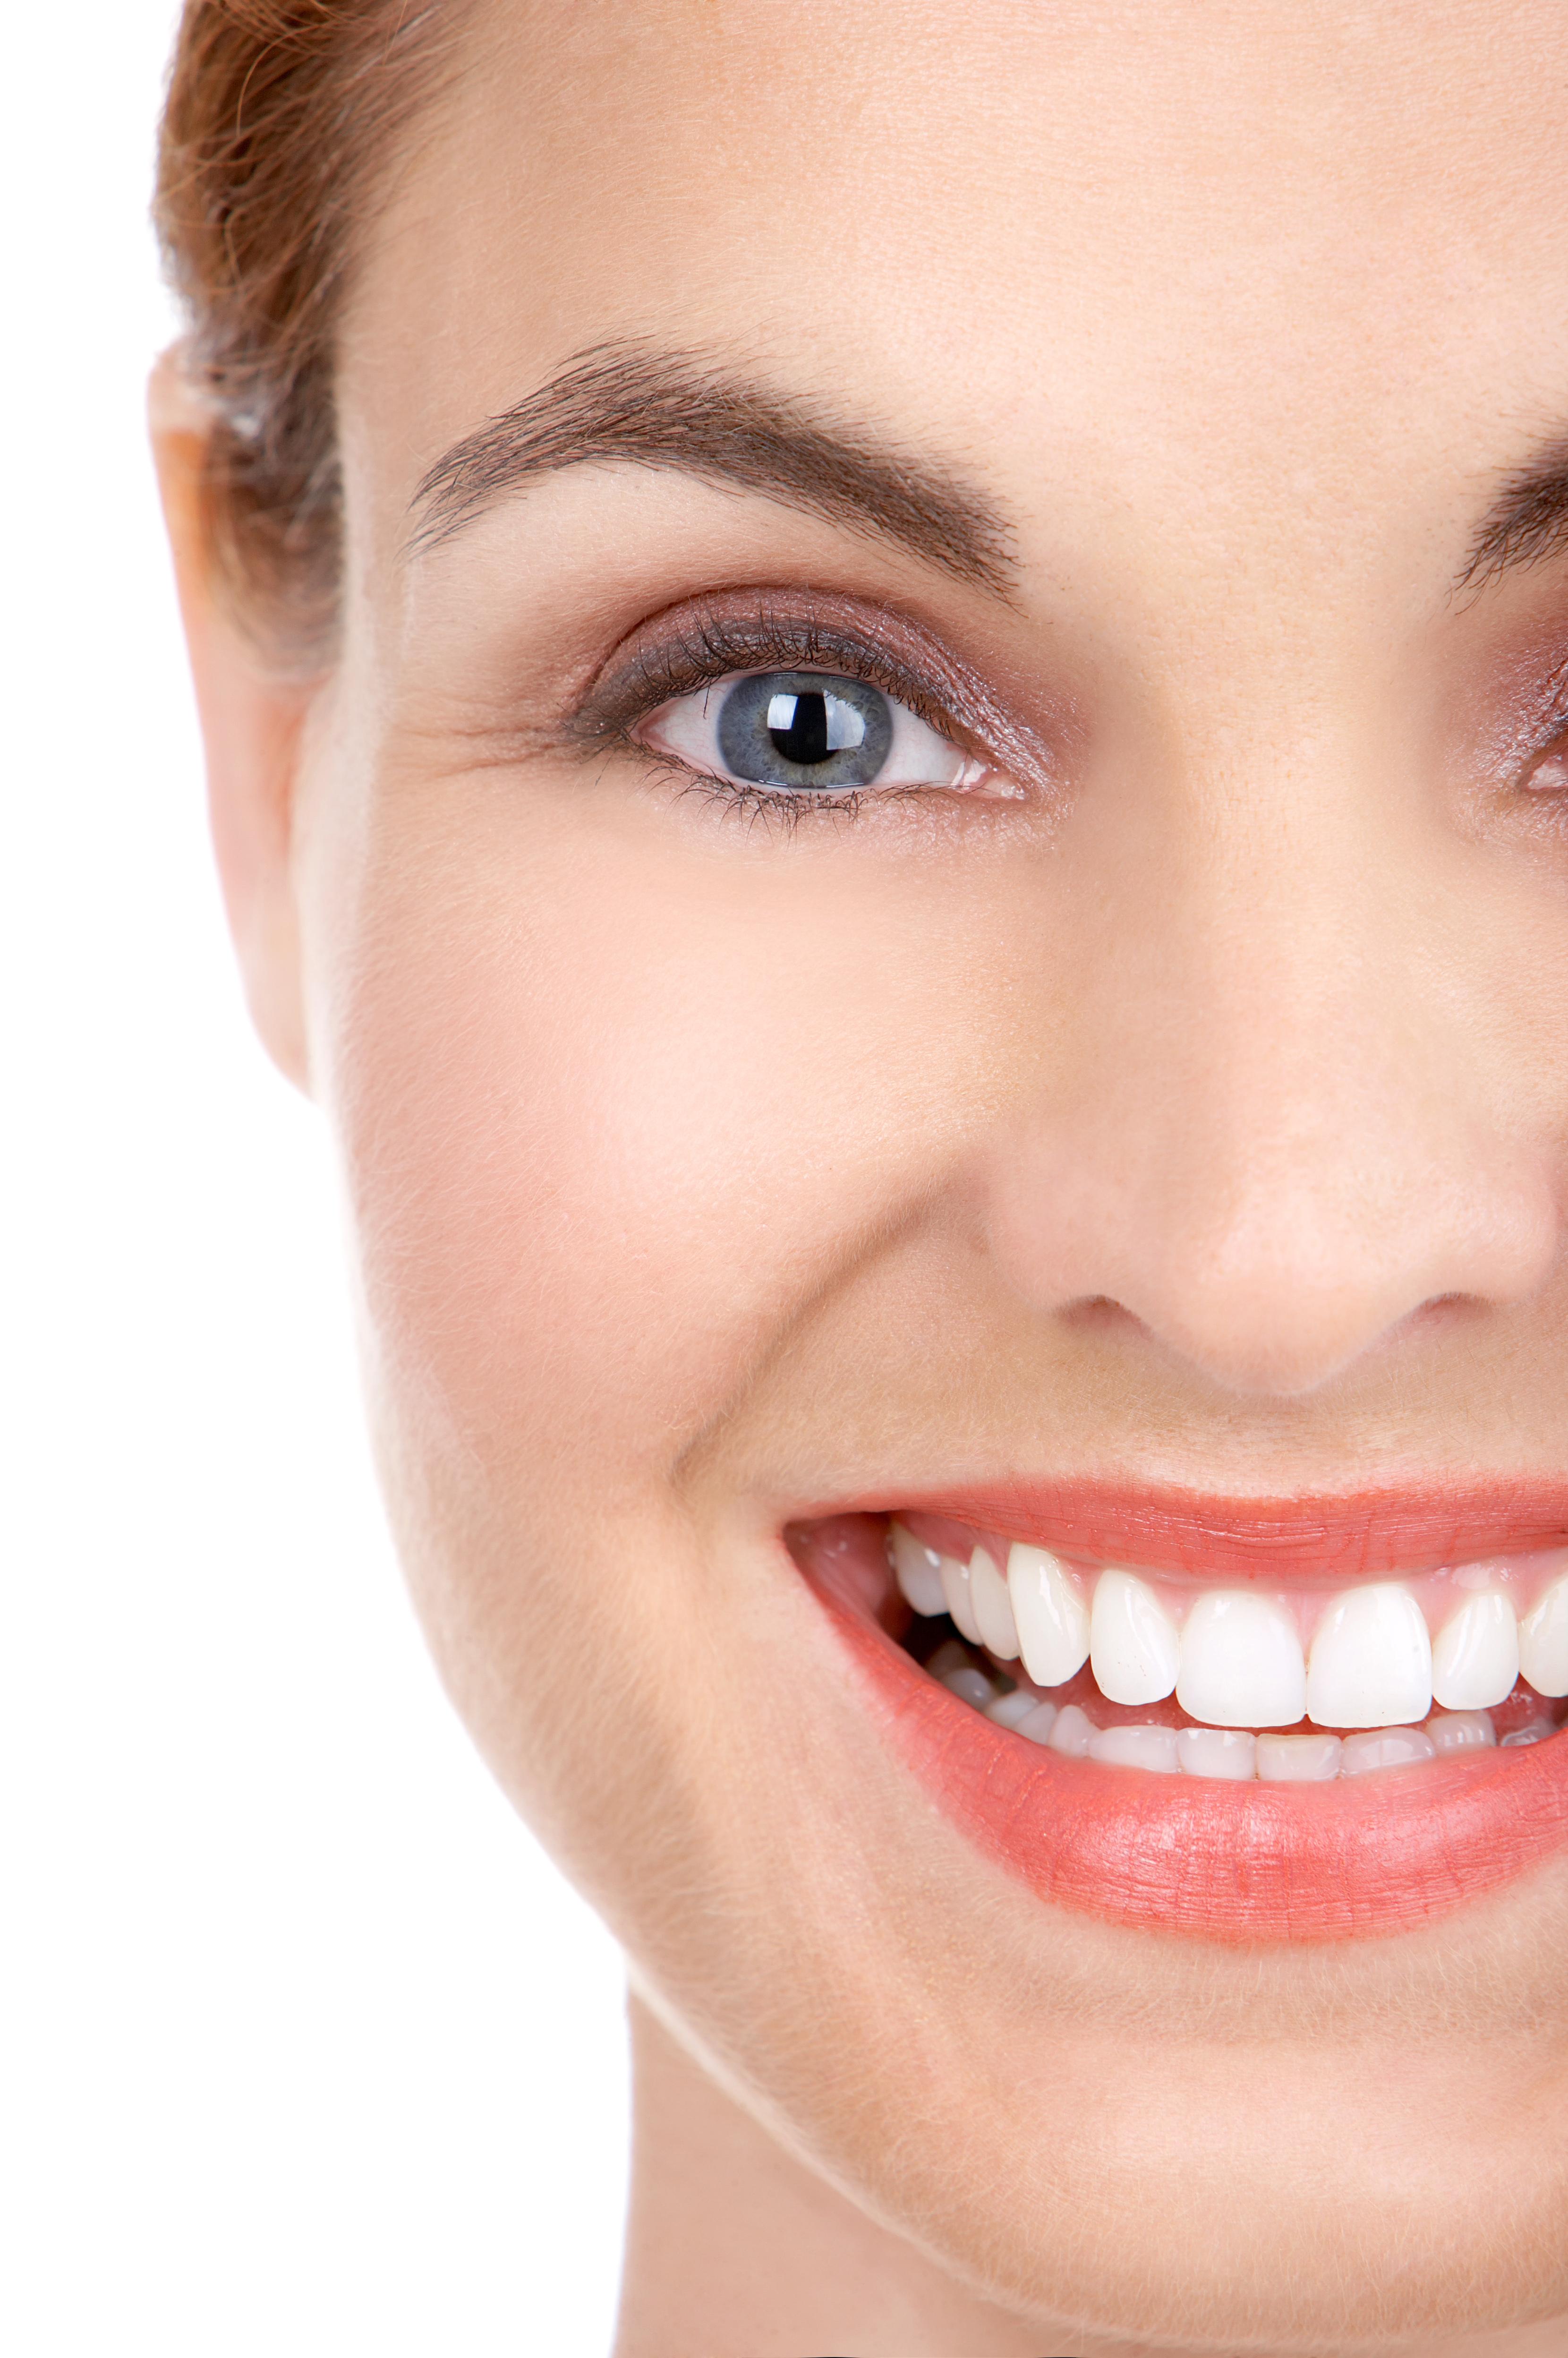 Not cosmetic dentist facial symmetry theme